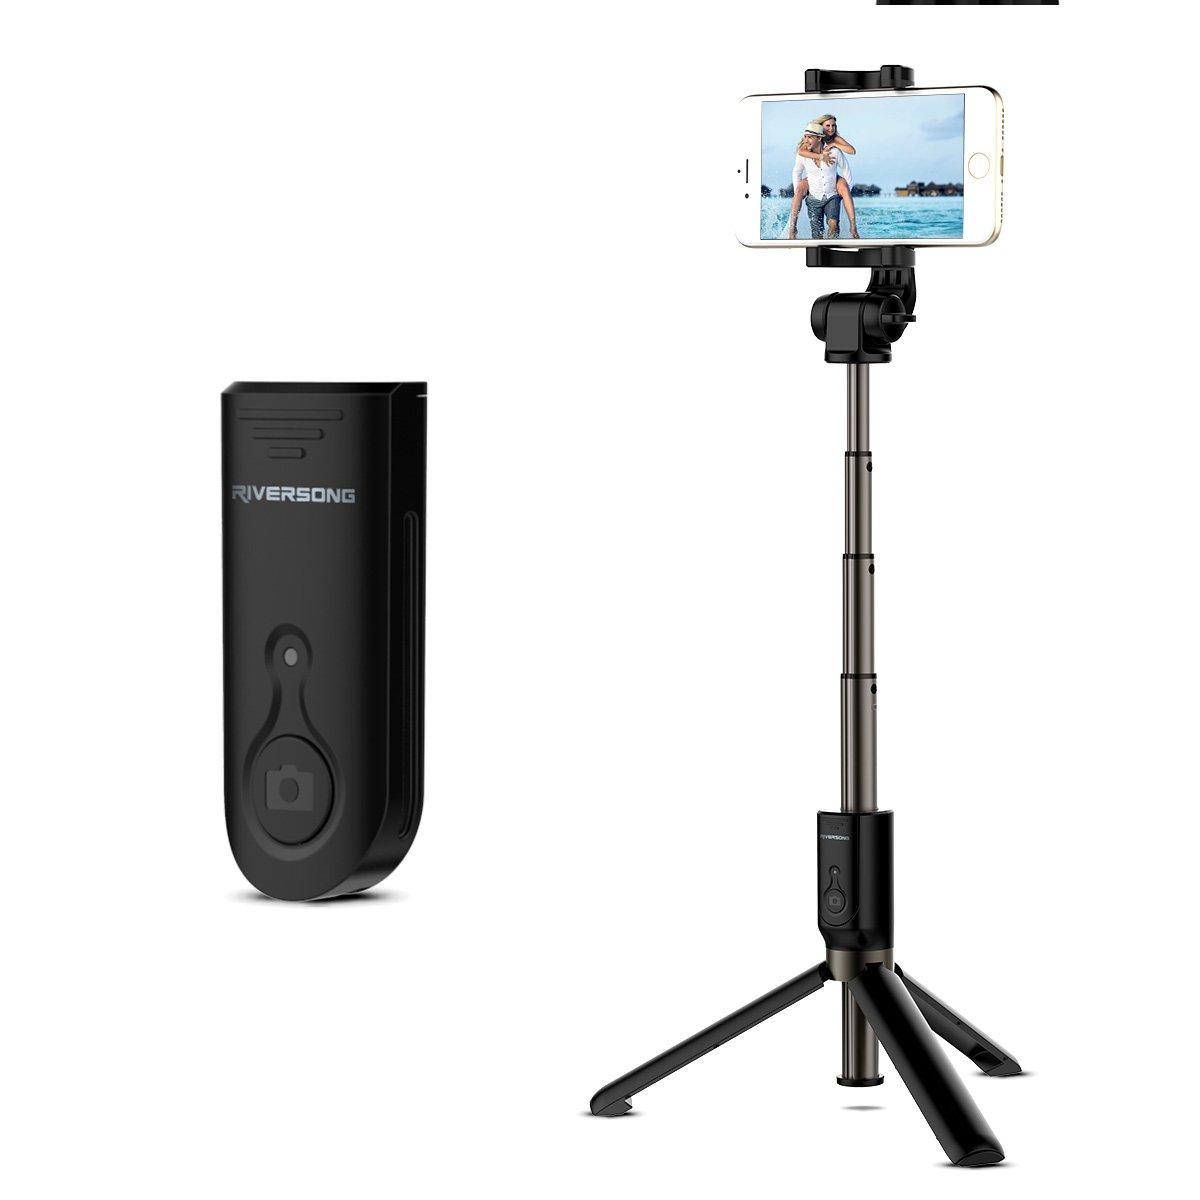 Bluetooth Trípode Selfie Palo Selfie para iphone s plus Samsung Huawei Oneplus